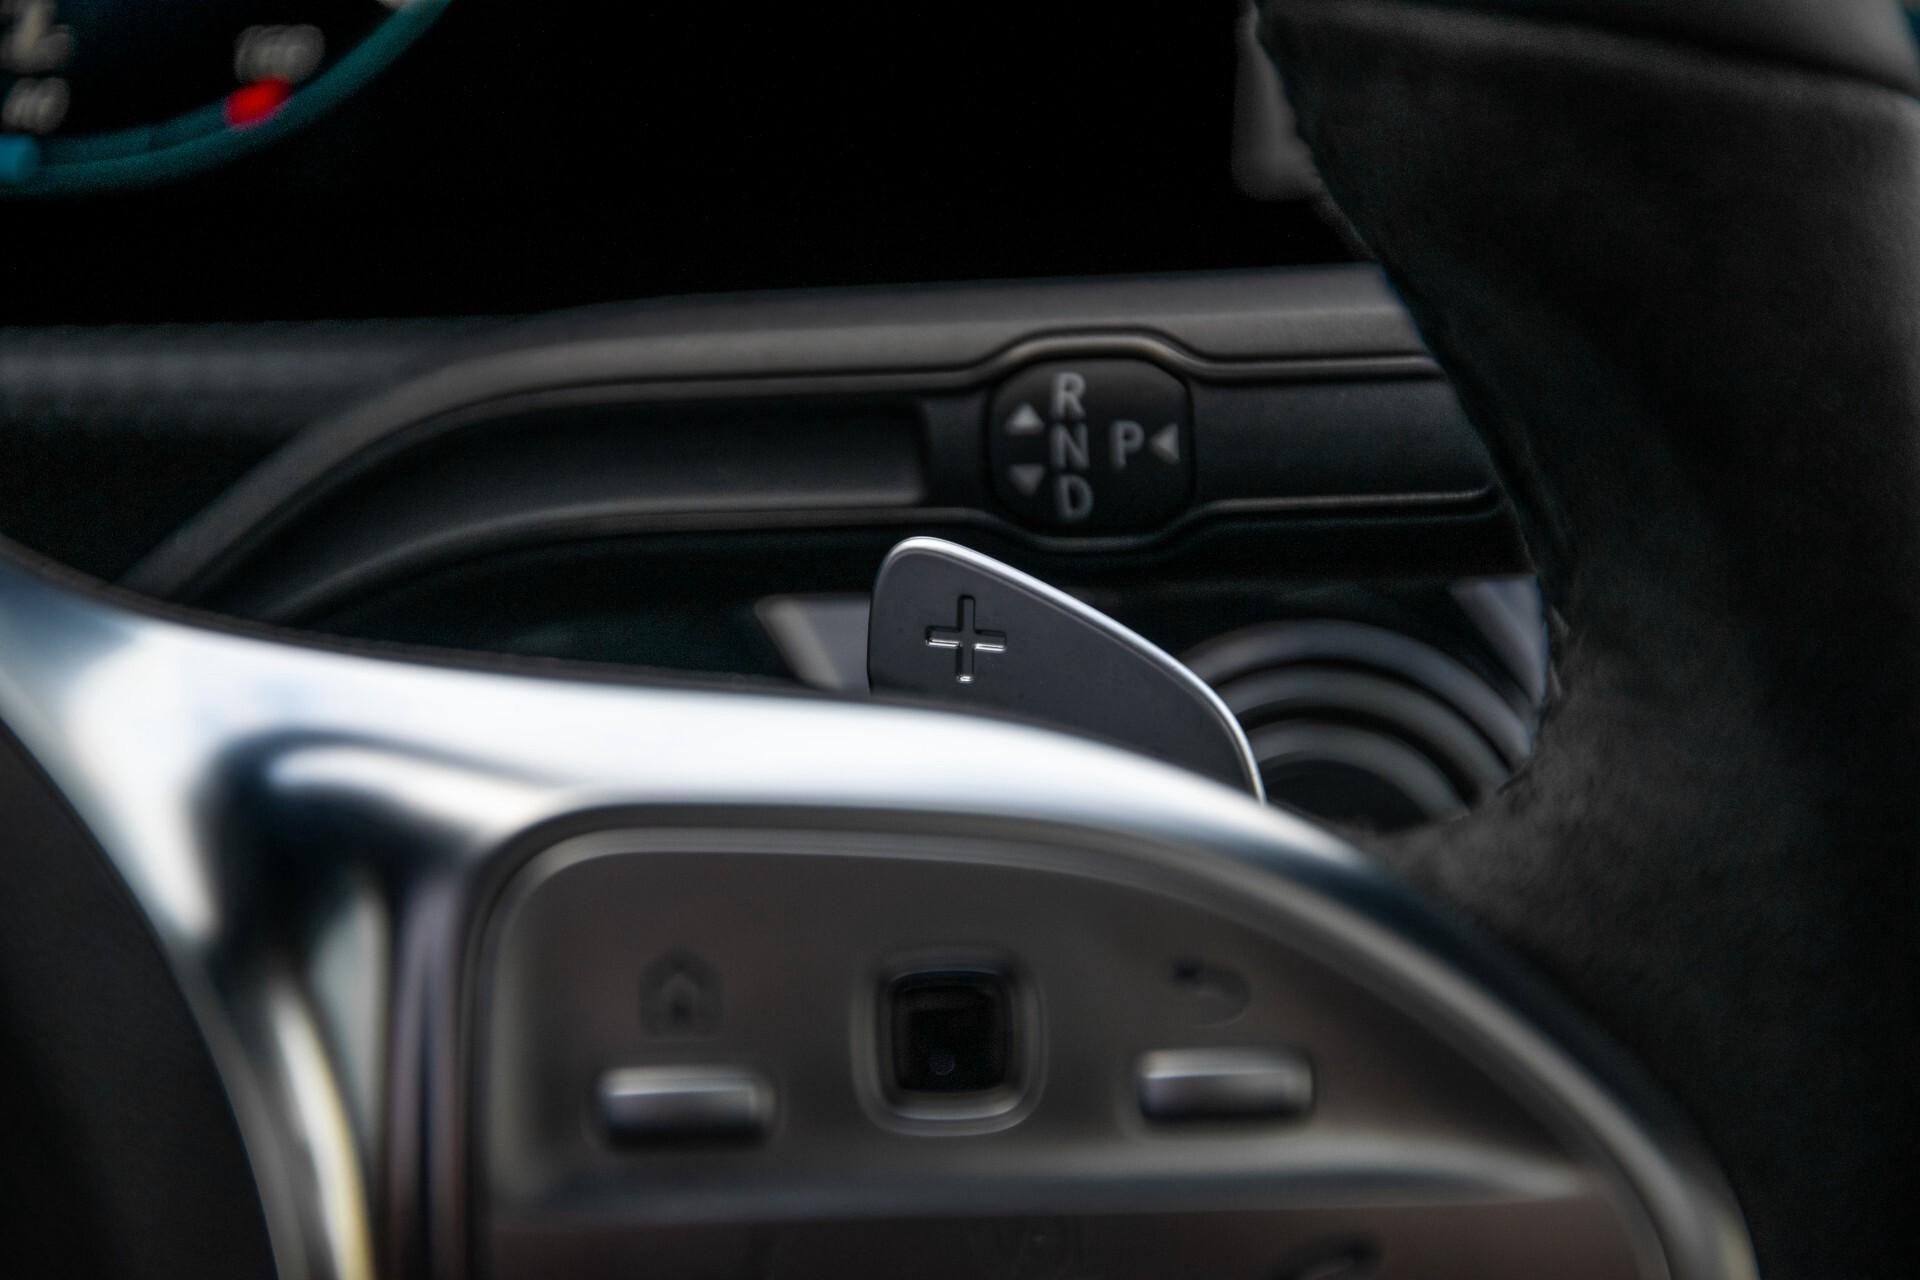 Mercedes-Benz A-Klasse 250 4-M AMG Panorama/Keyless-Entry/MBUX/HUD/Burmester/360/Multibeam LED Aut7 Foto 14